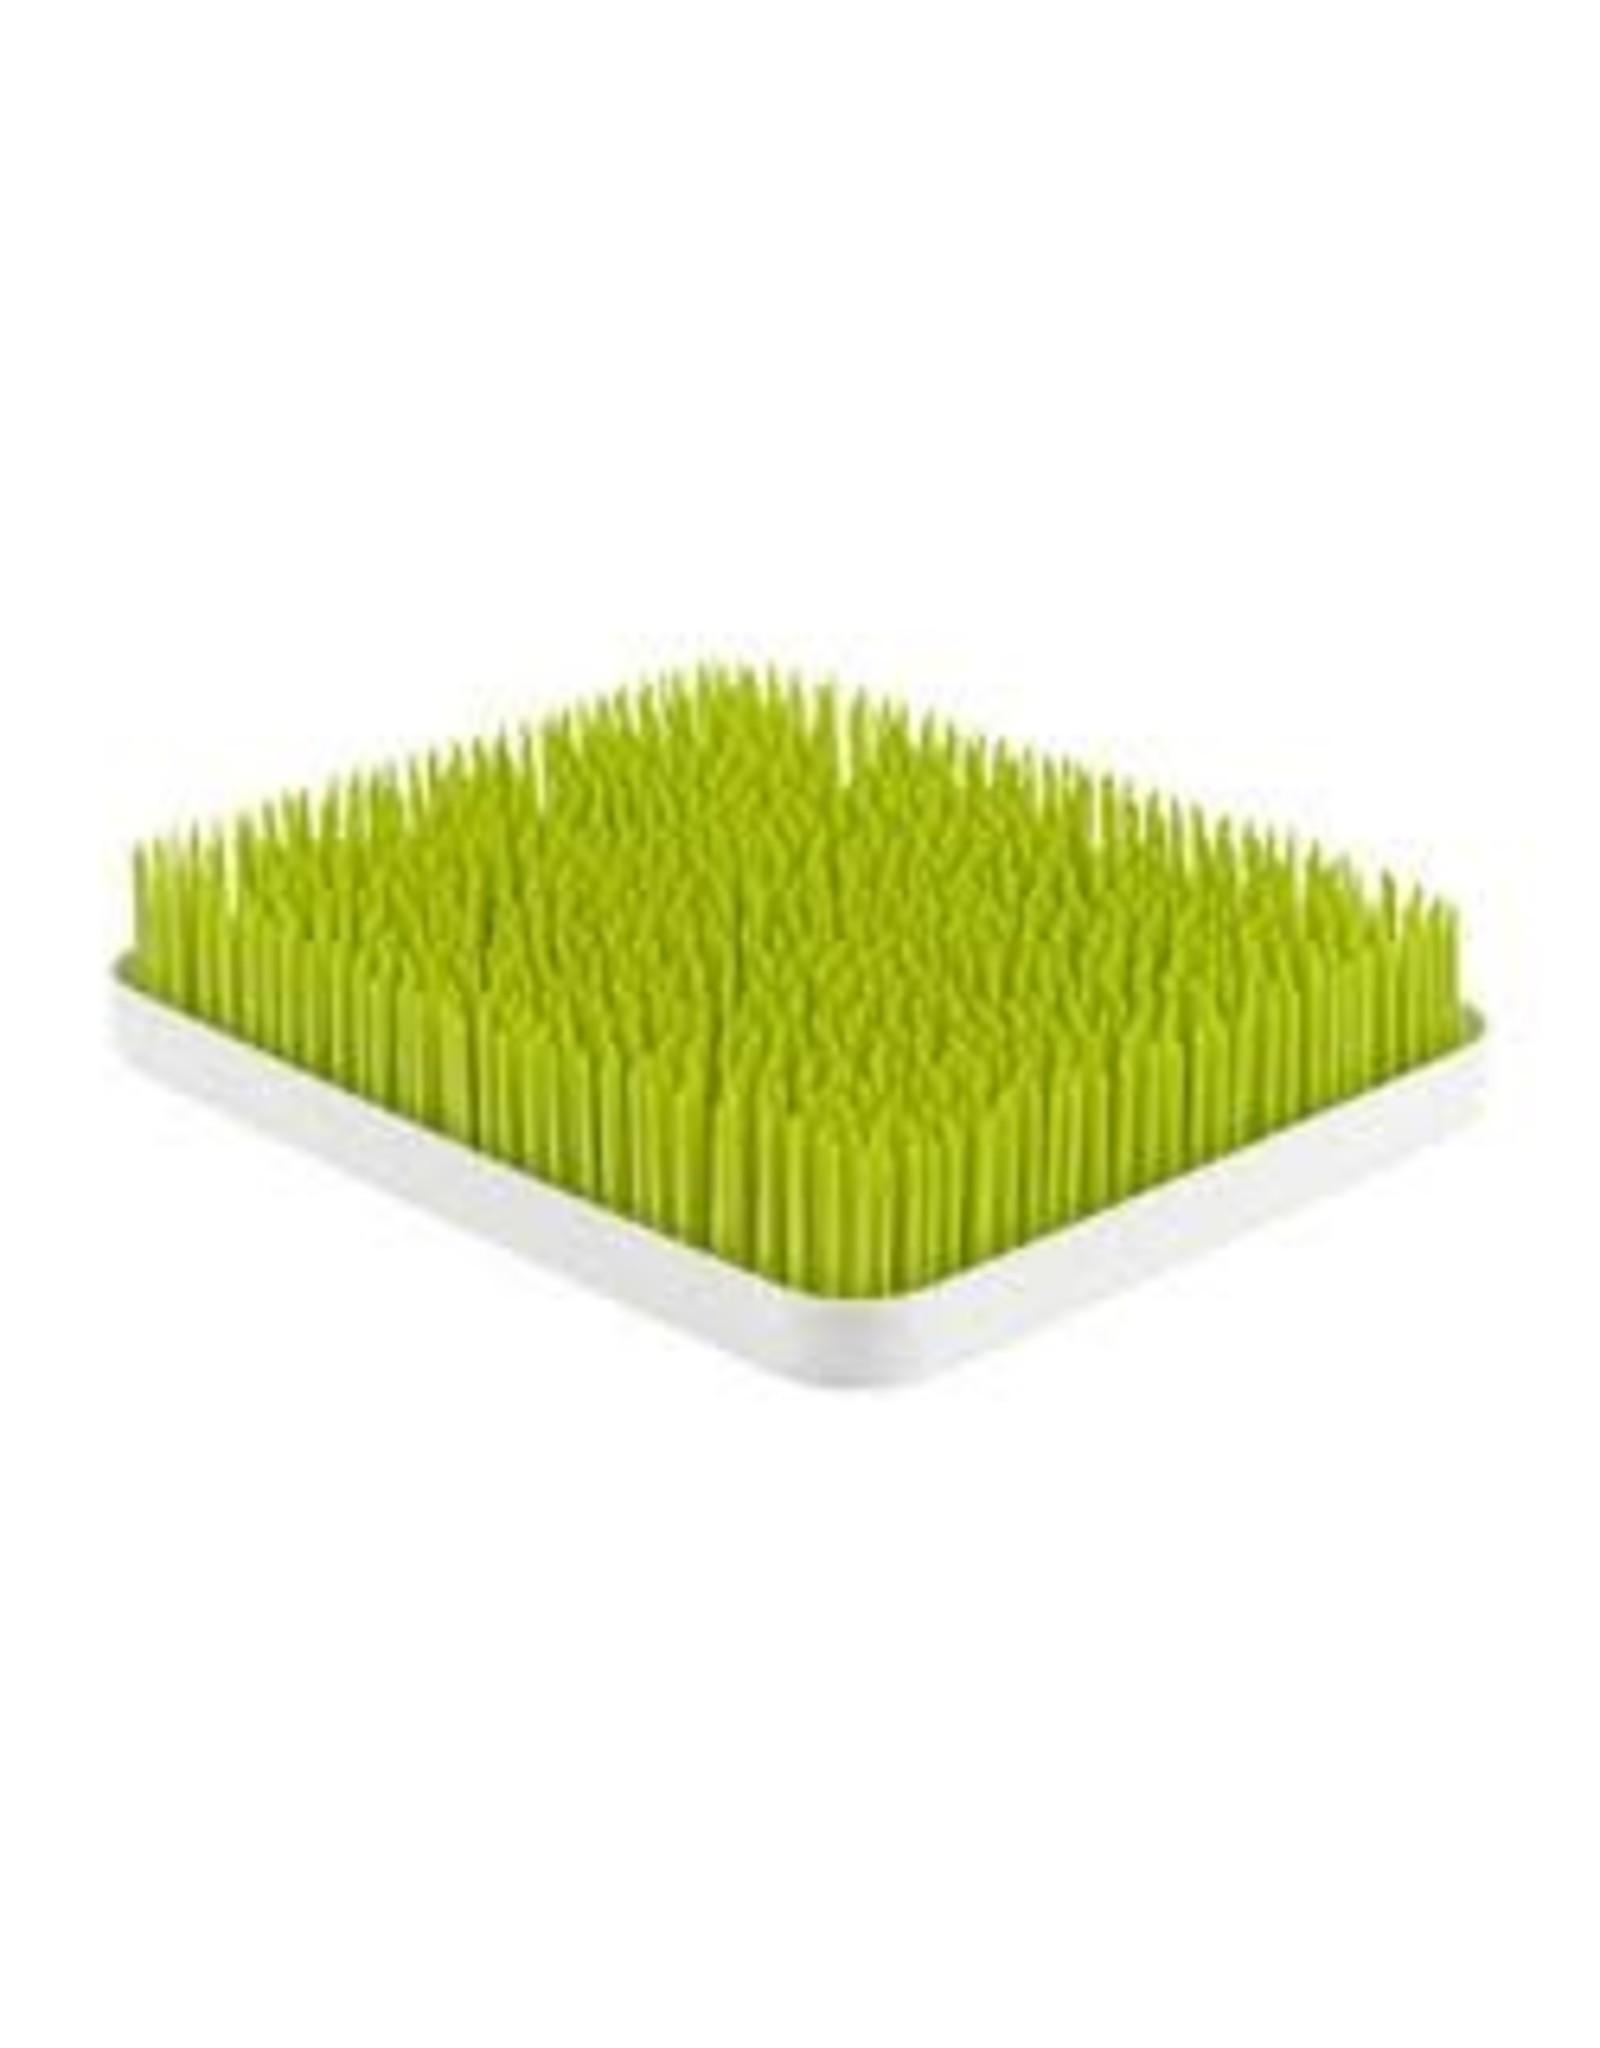 Boon Lawn Drying Rack, Green/White